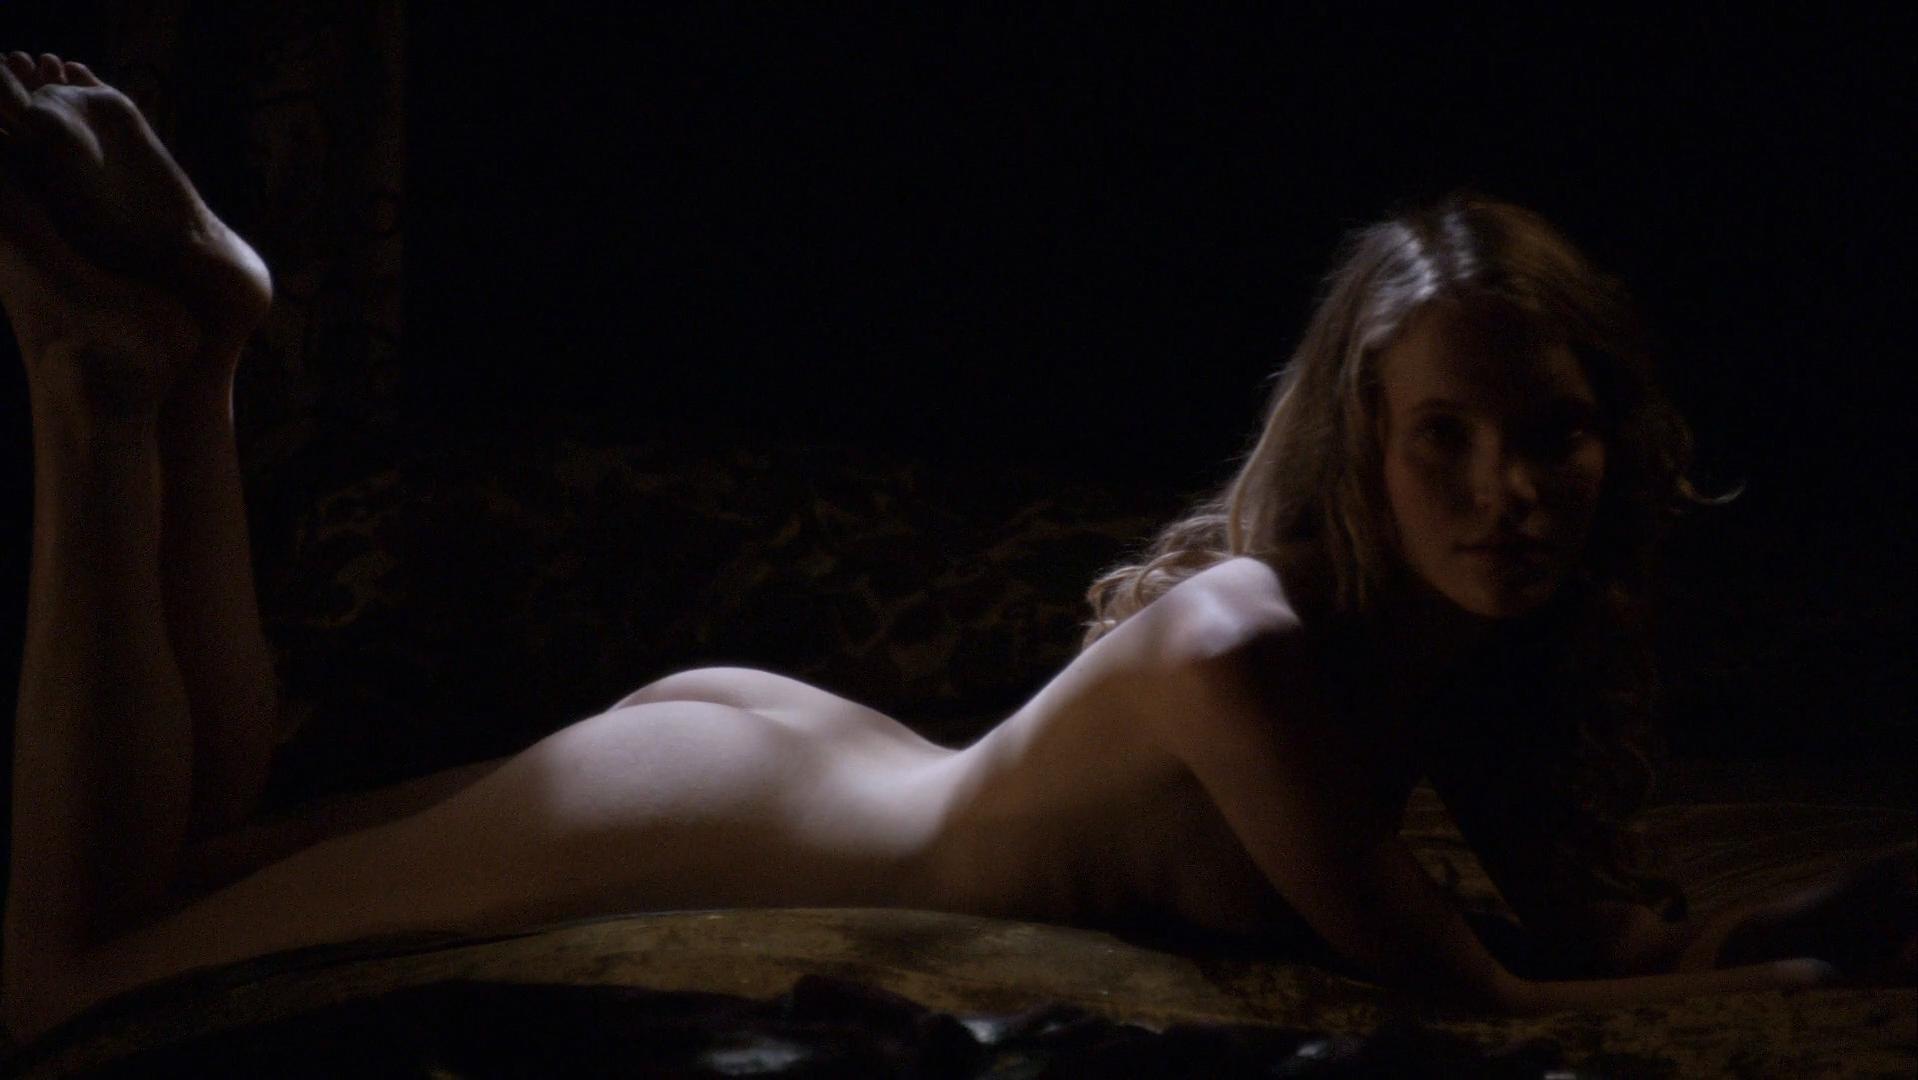 Butt Tamzin Merchant nudes (99 pictures) Feet, YouTube, lingerie